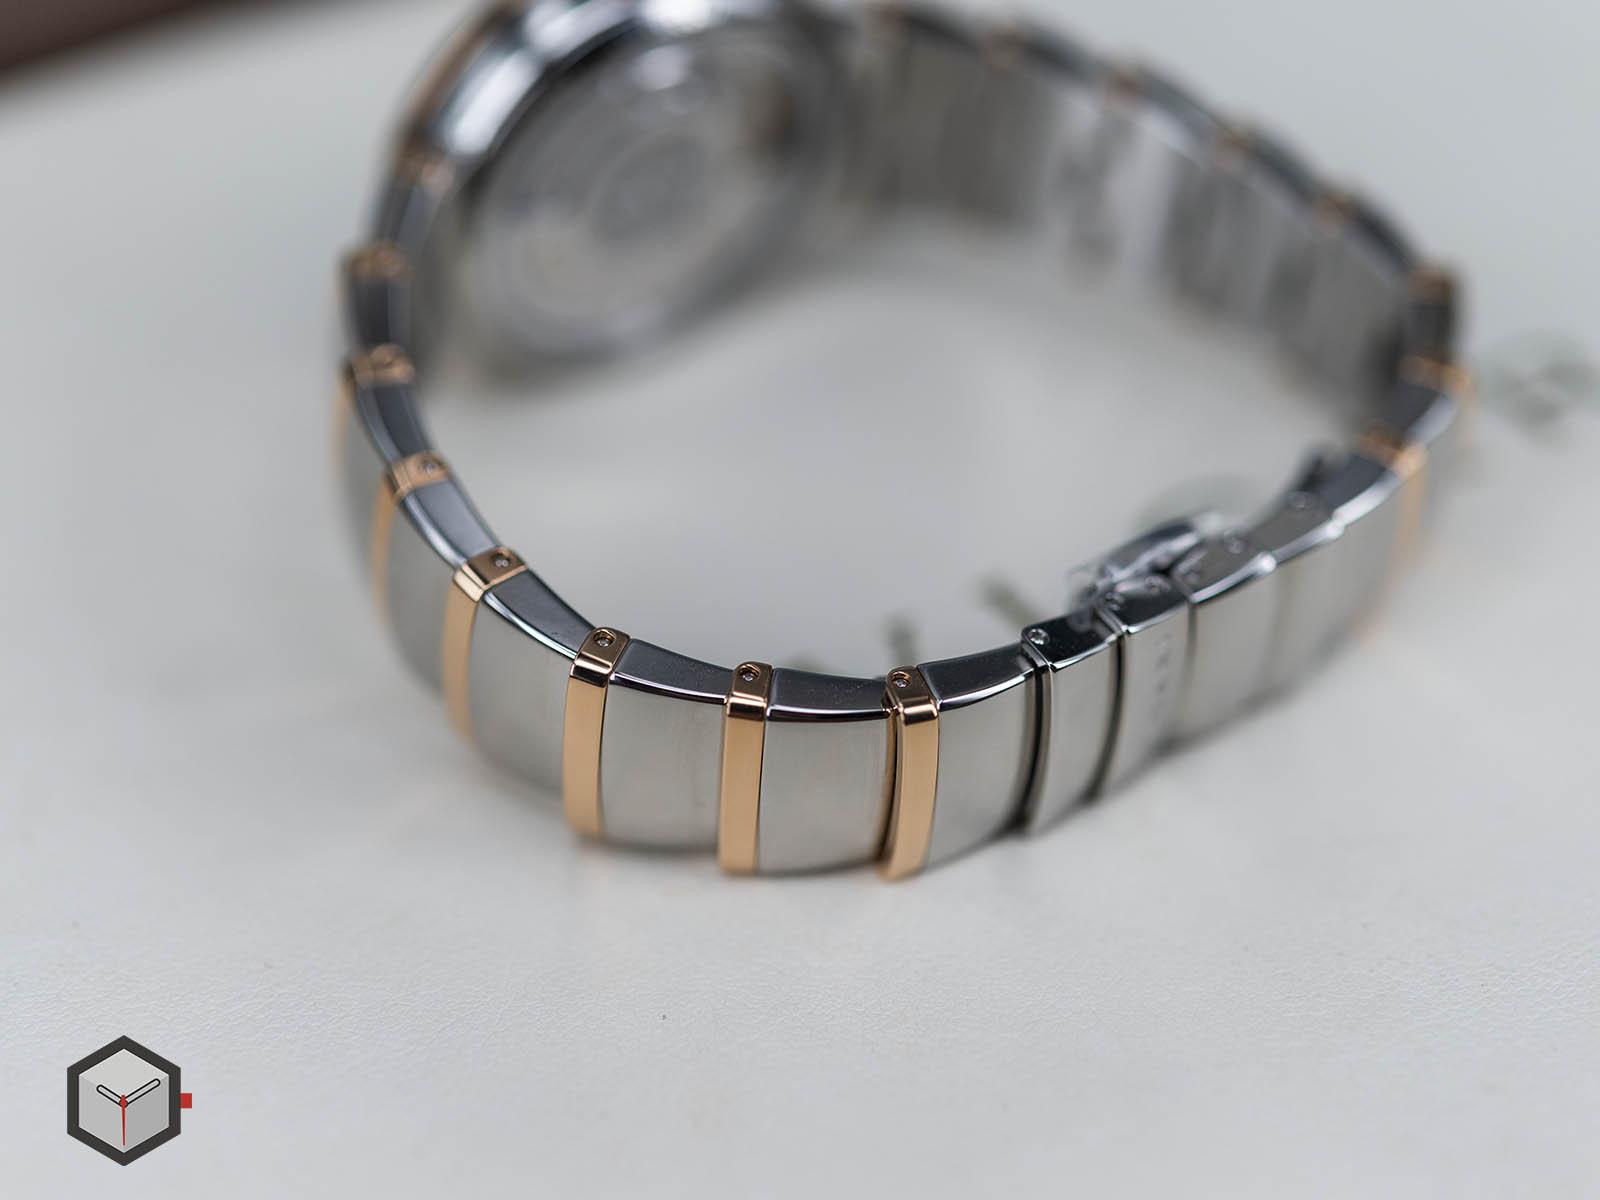 102980-bulgari-lvcea-automatic-stainless-steel-gold-11.jpg